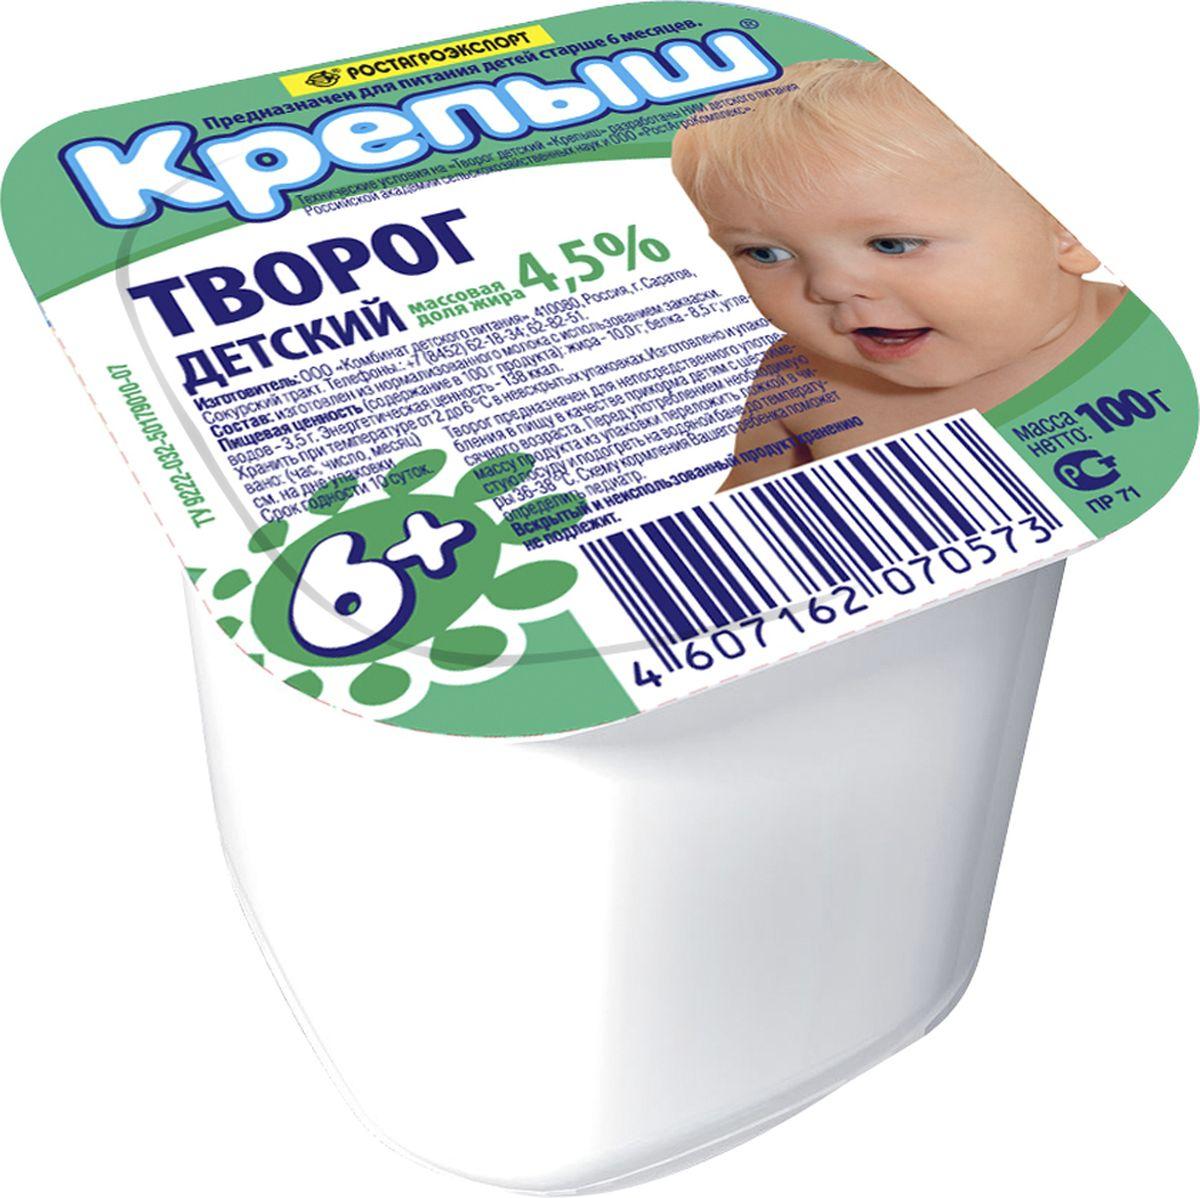 Крепыш Творог детский 4,5%, 100 г кефир крепыш 3 2